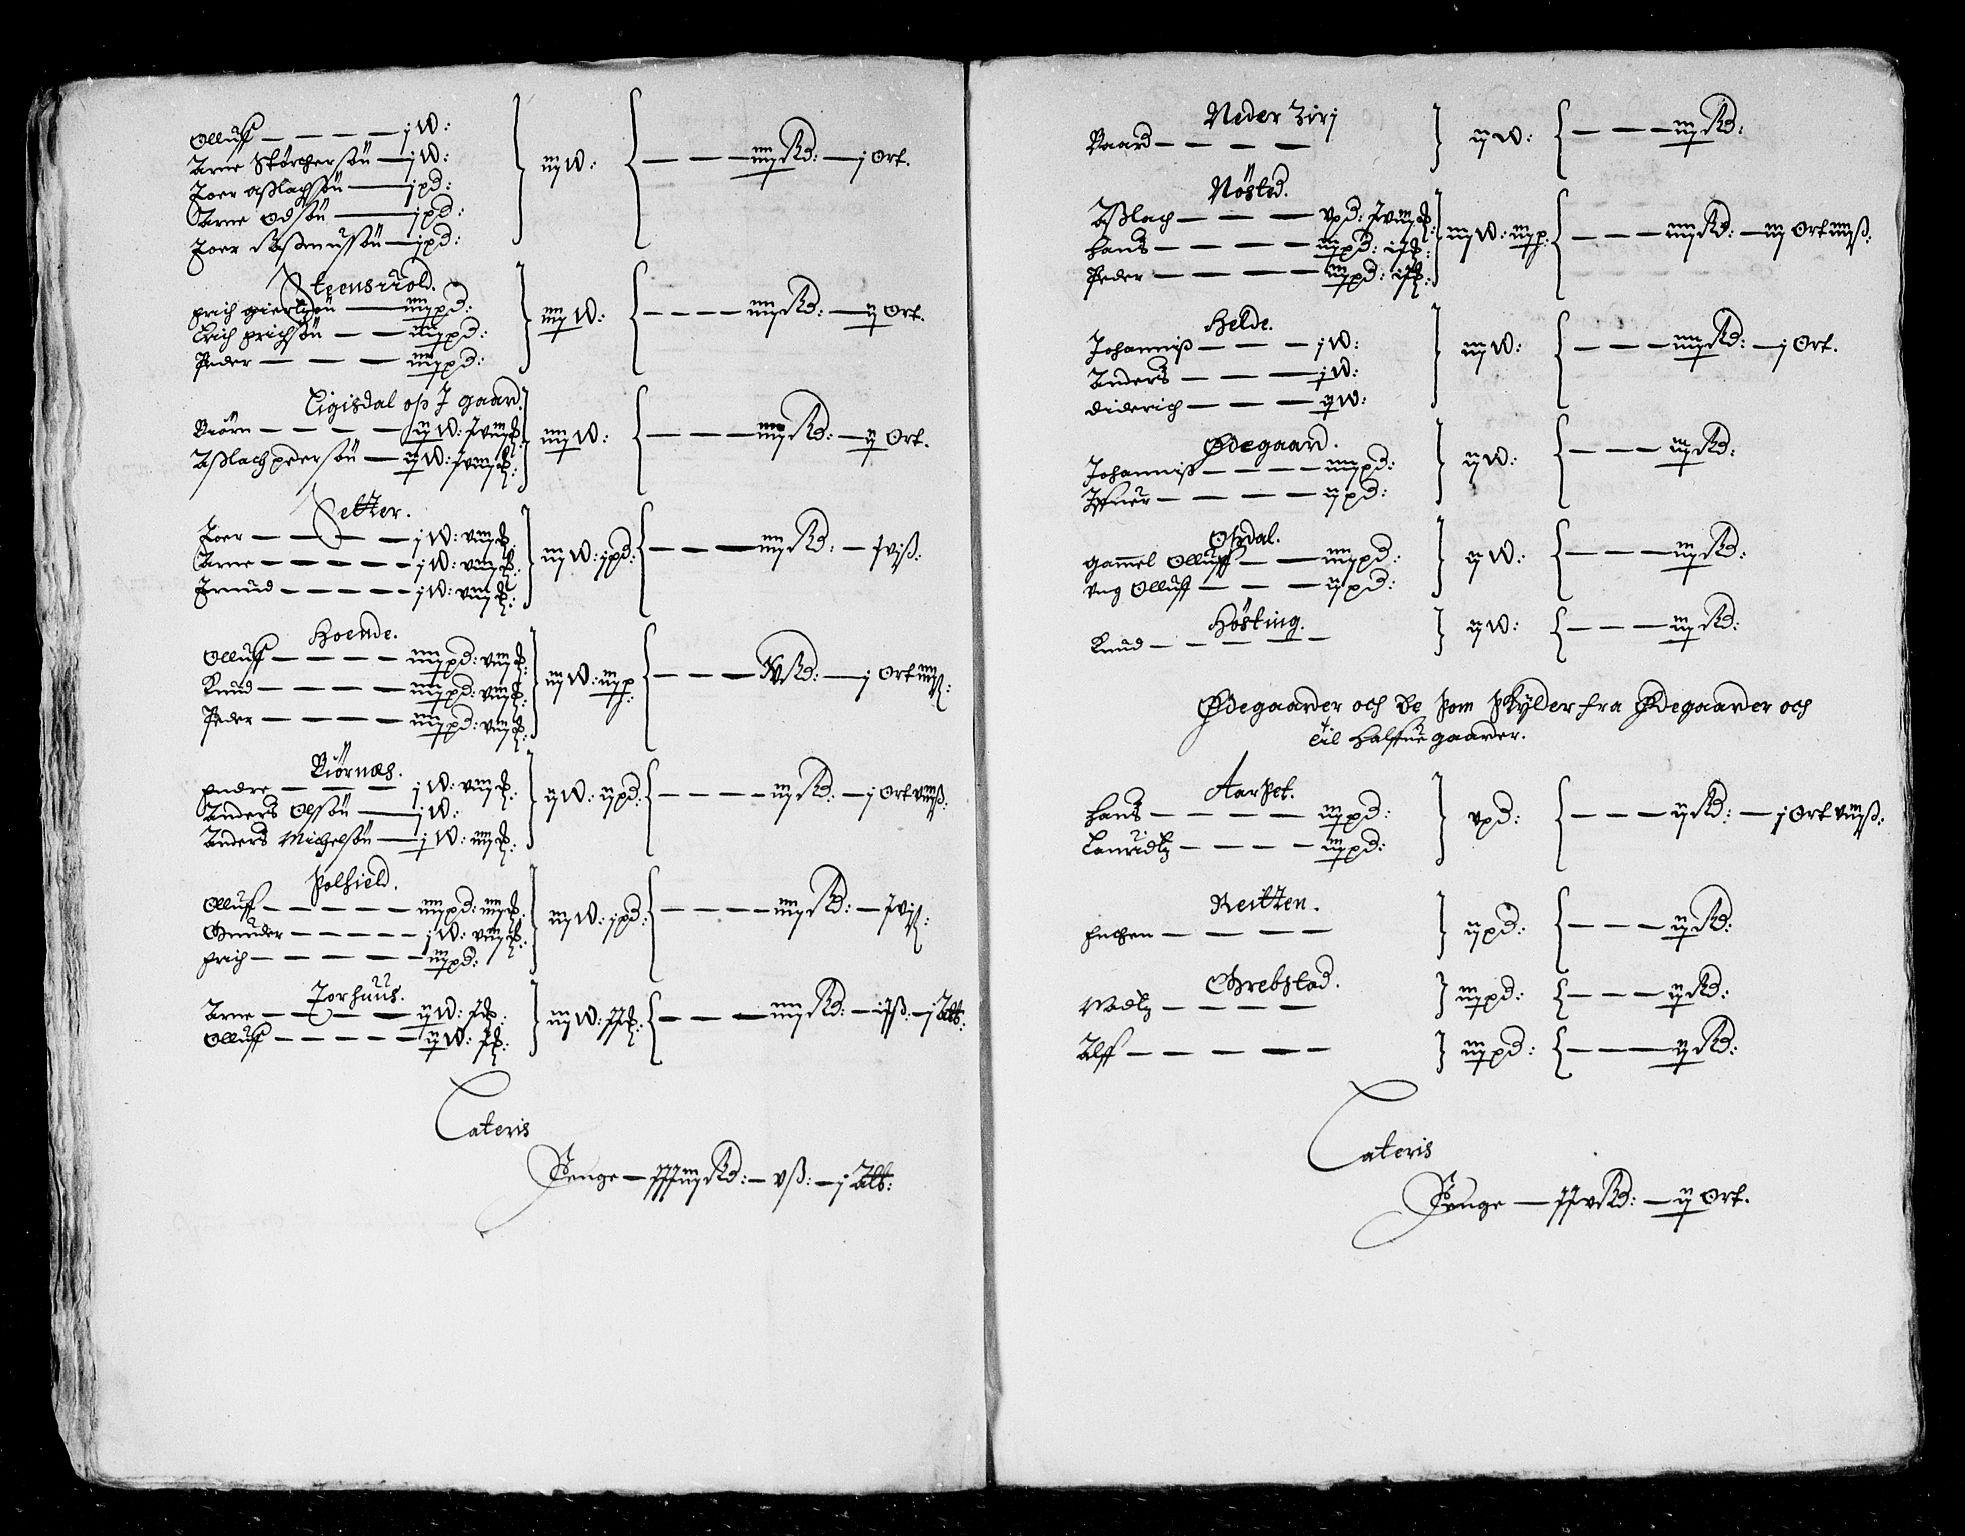 RA, Rentekammeret inntil 1814, Reviderte regnskaper, Stiftamtstueregnskaper, Trondheim stiftamt og Nordland amt, R/Rd/L0017: Trondheim stiftamt, 1666